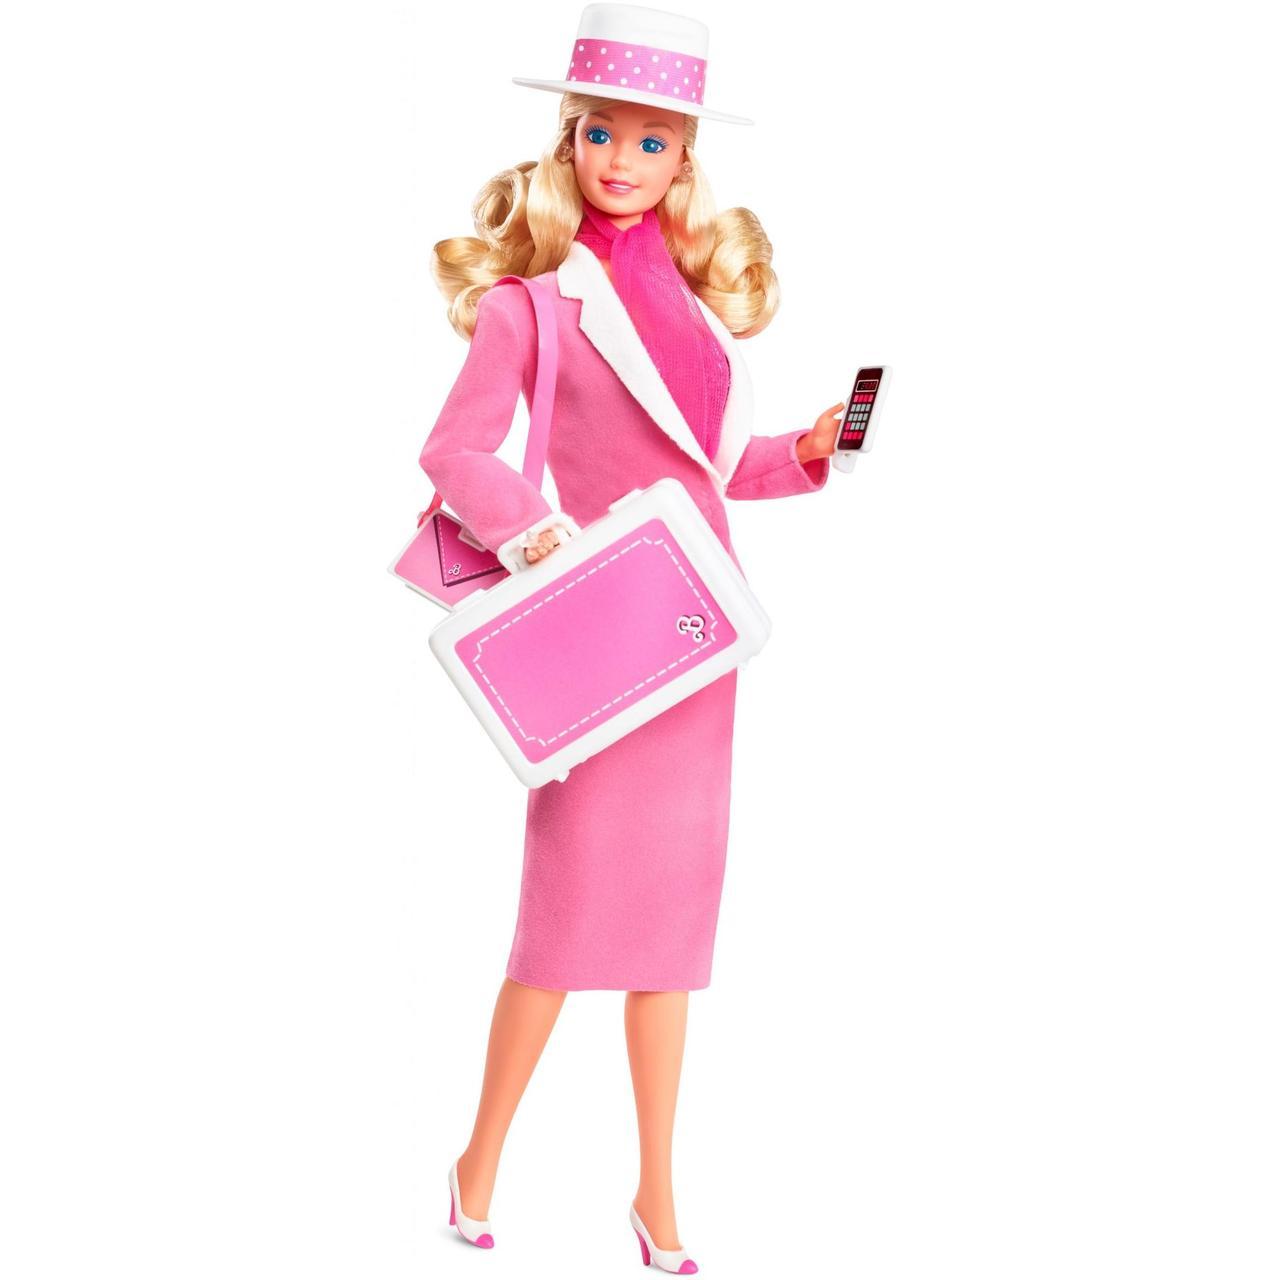 Кукла Барби Модная революция коллекционная Barbie Day to Night Fashion